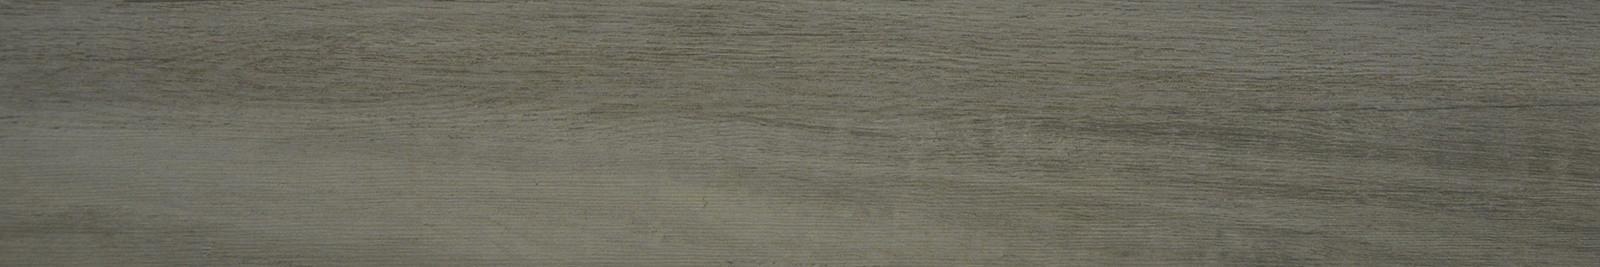 ariostea legni high tech h lzer 20x120 cm rovere cenere. Black Bedroom Furniture Sets. Home Design Ideas